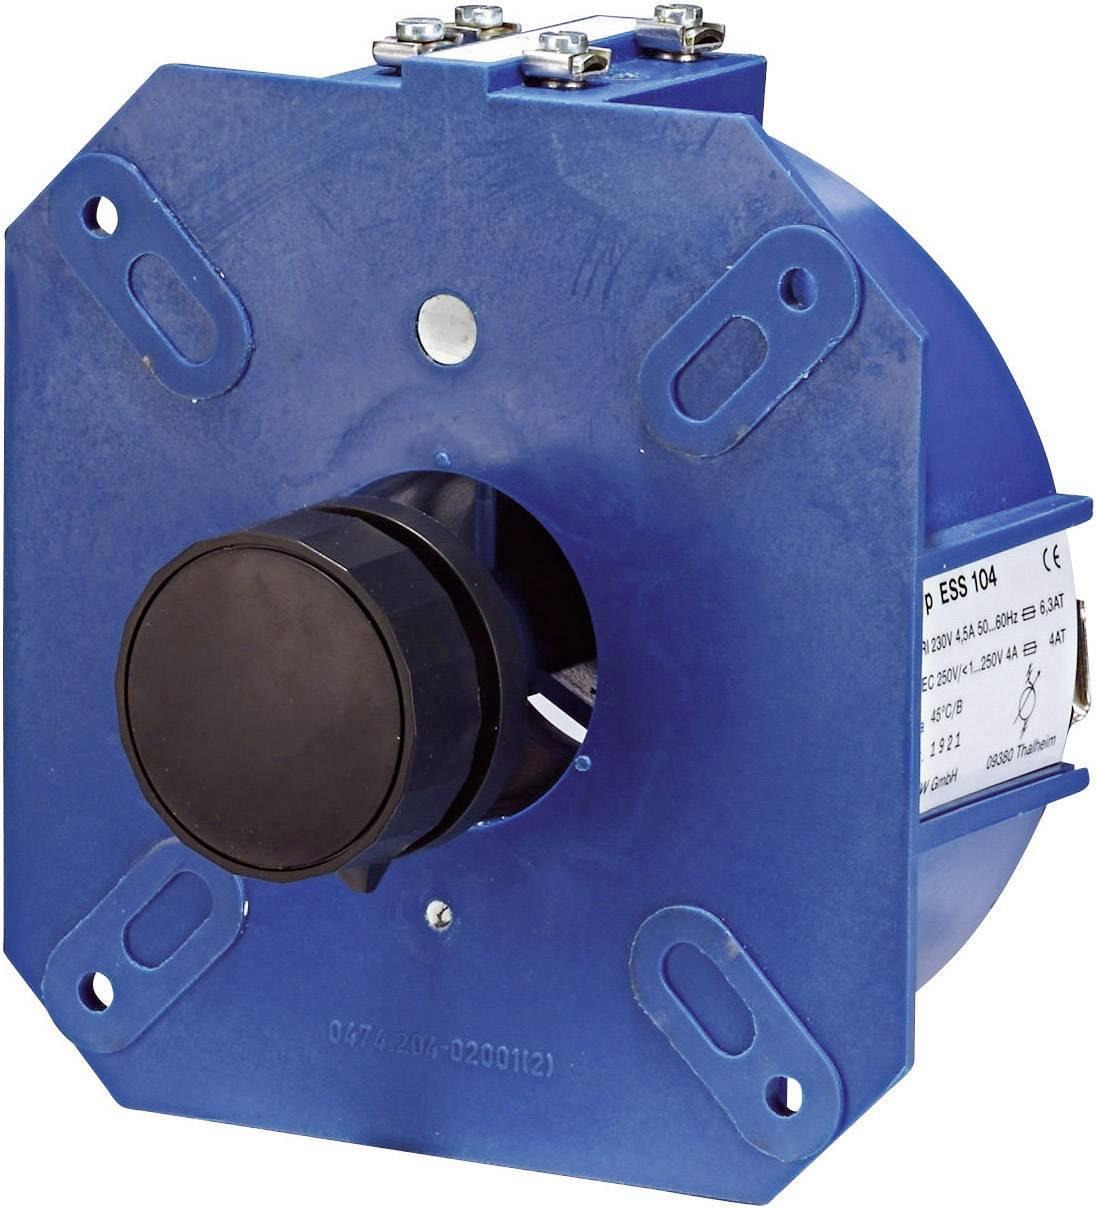 Regulačný transformátor Thalheimer ESS 104, 1000 VA